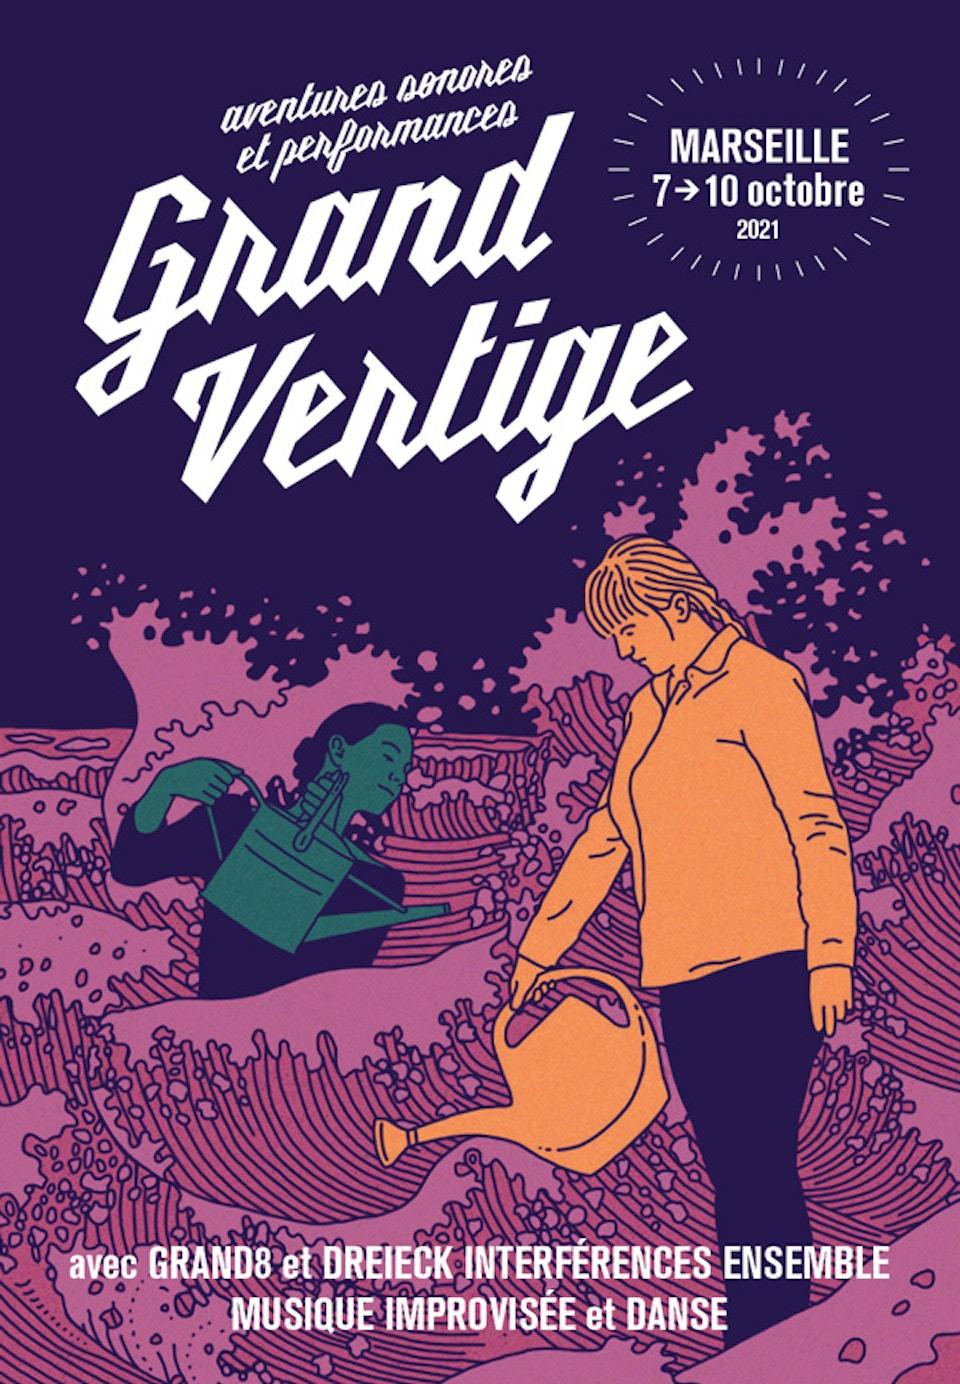 Grand Vertige | Grand8, Marseille [2021]